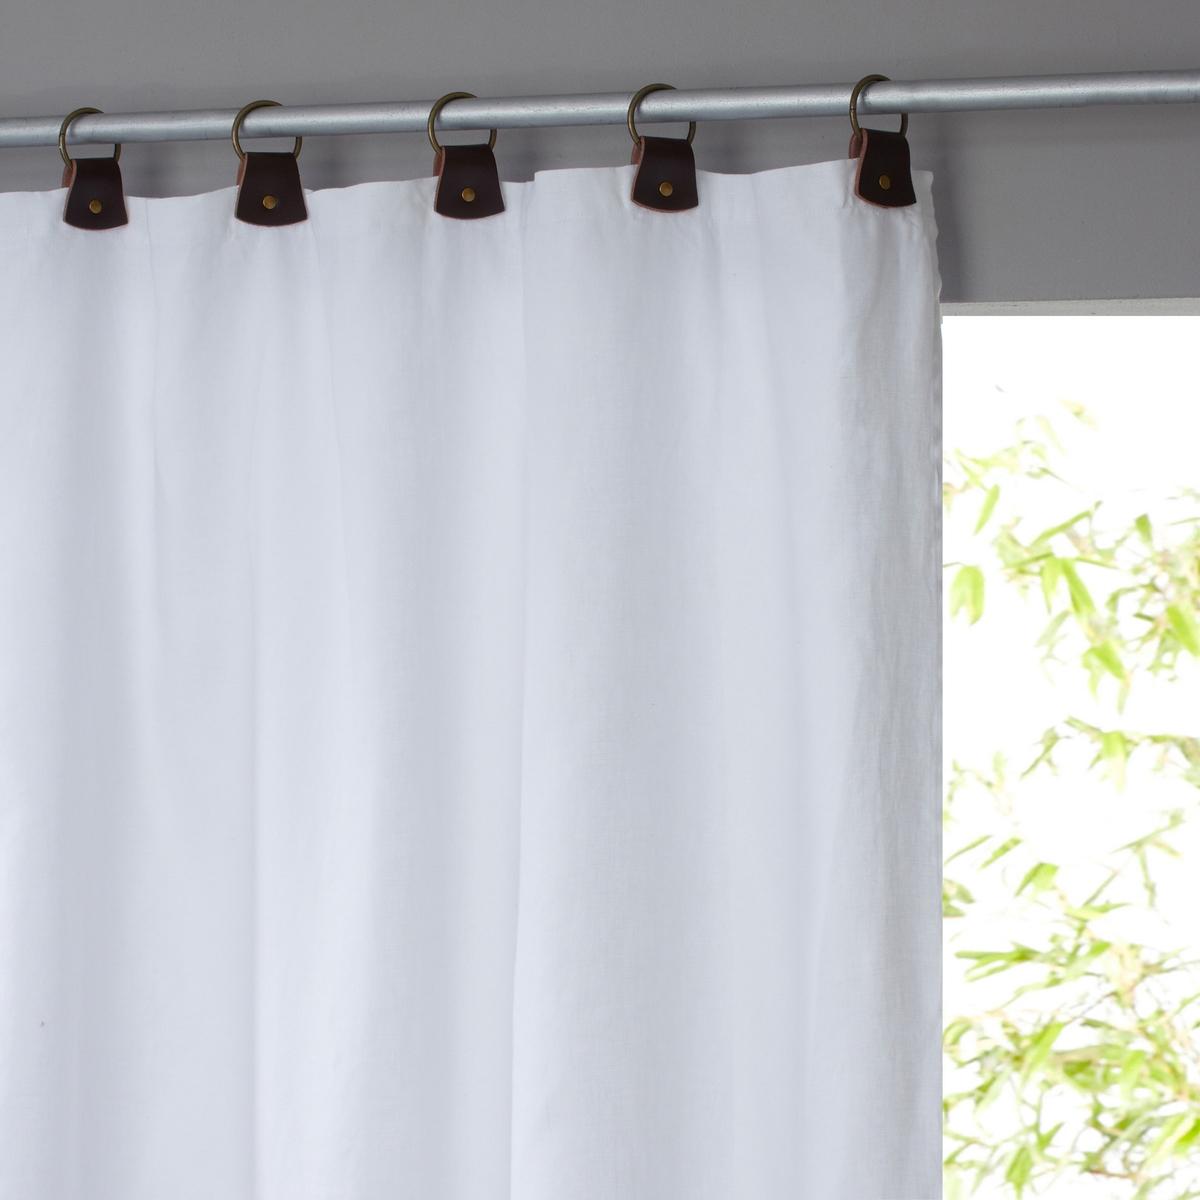 Штора La Redoute Из льна на подкладке с кожаными шлевками Private 140 x 260 см белый комплект из полотенце для la redoute рук из хлопка и льна nipaly 50 x 100 см белый